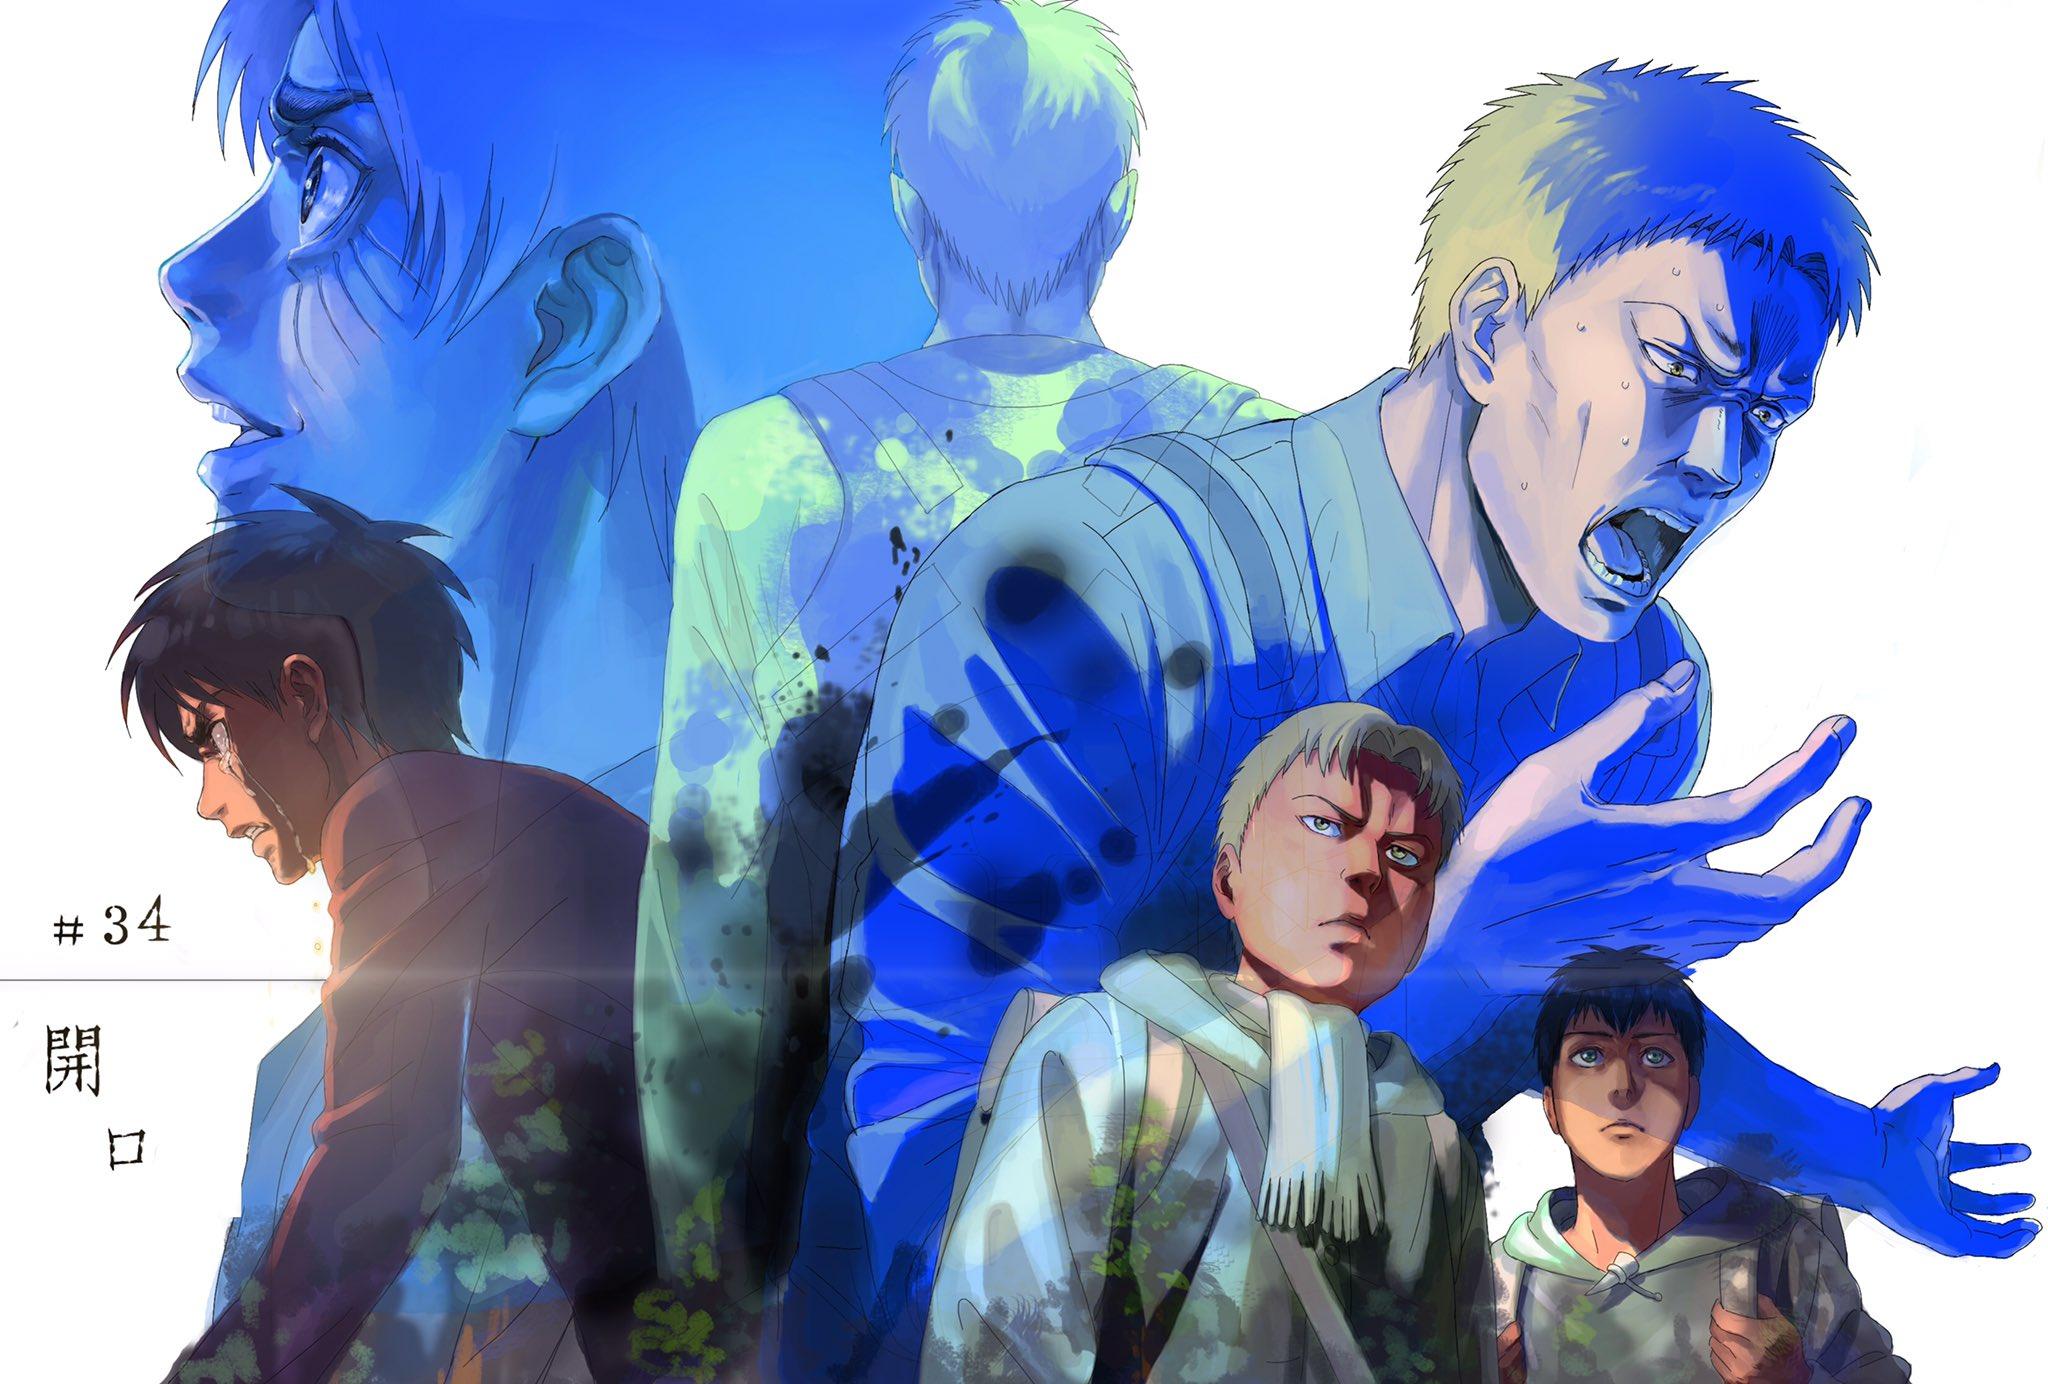 Alasan Mengapa Tokoh Shingeki No Kyojin Tak Boleh Didewakan